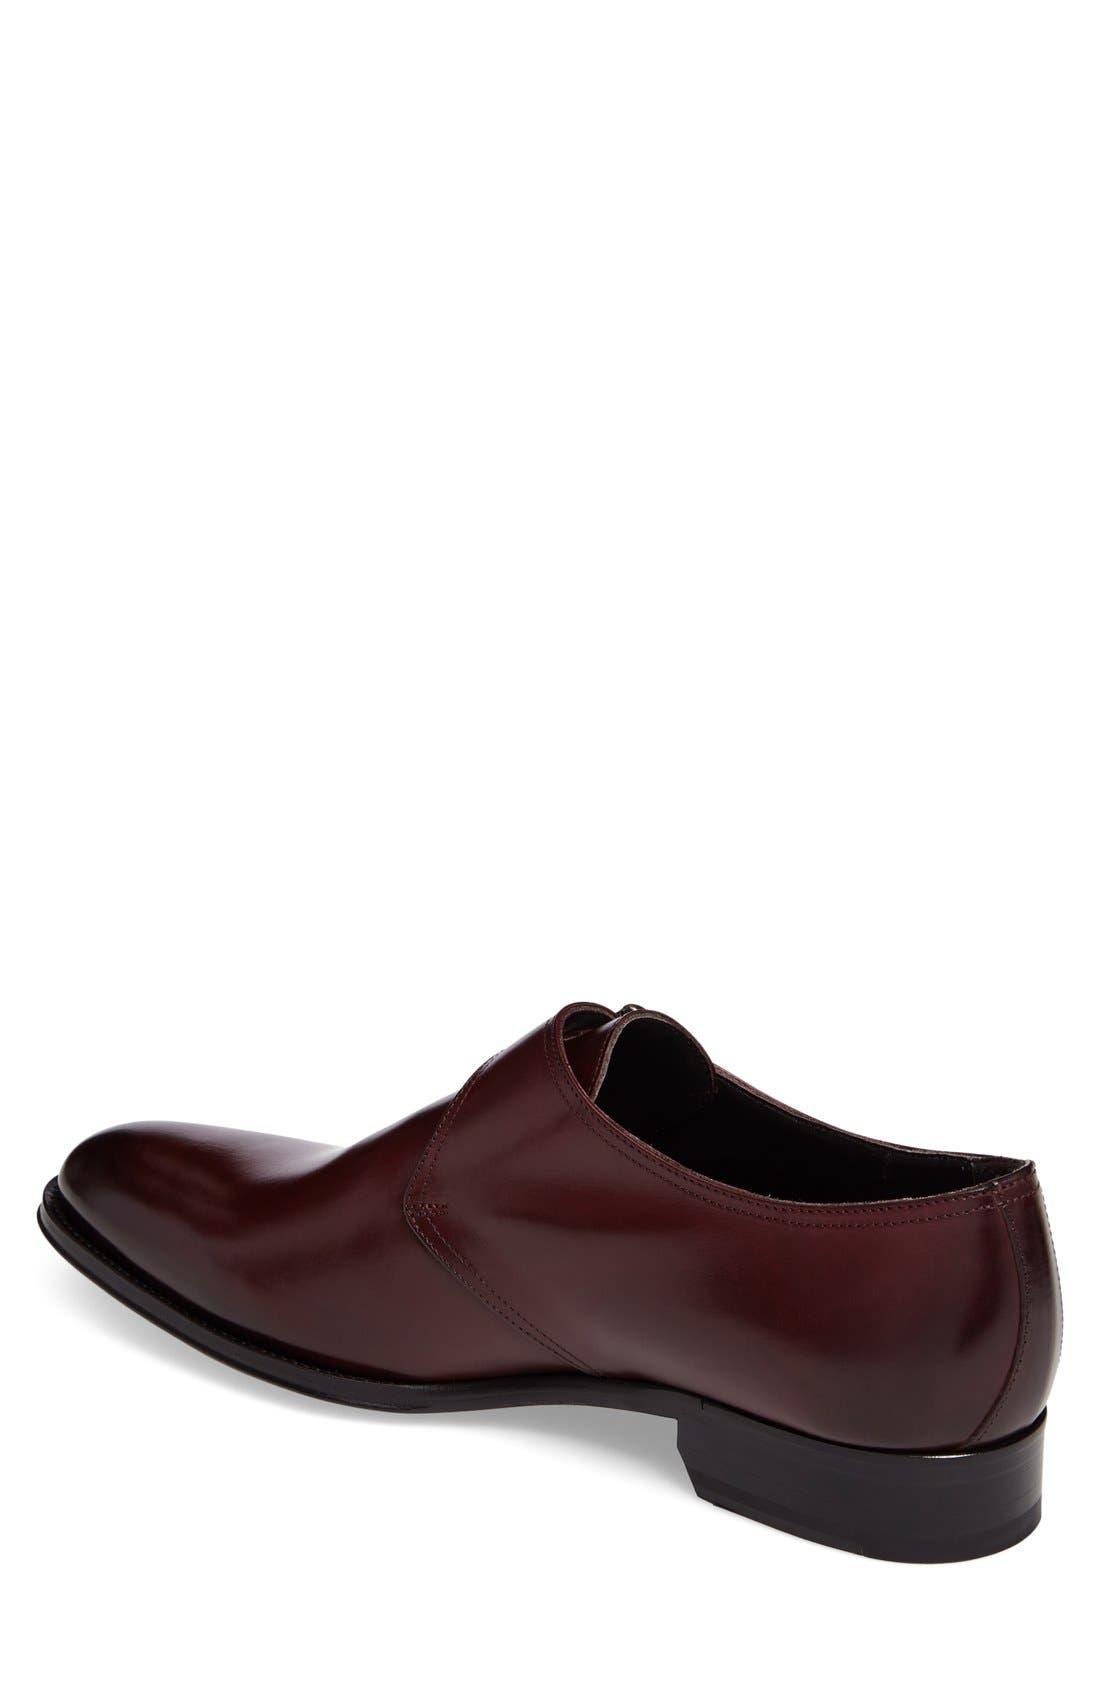 Emmett Monk Strap Shoe,                             Alternate thumbnail 15, color,